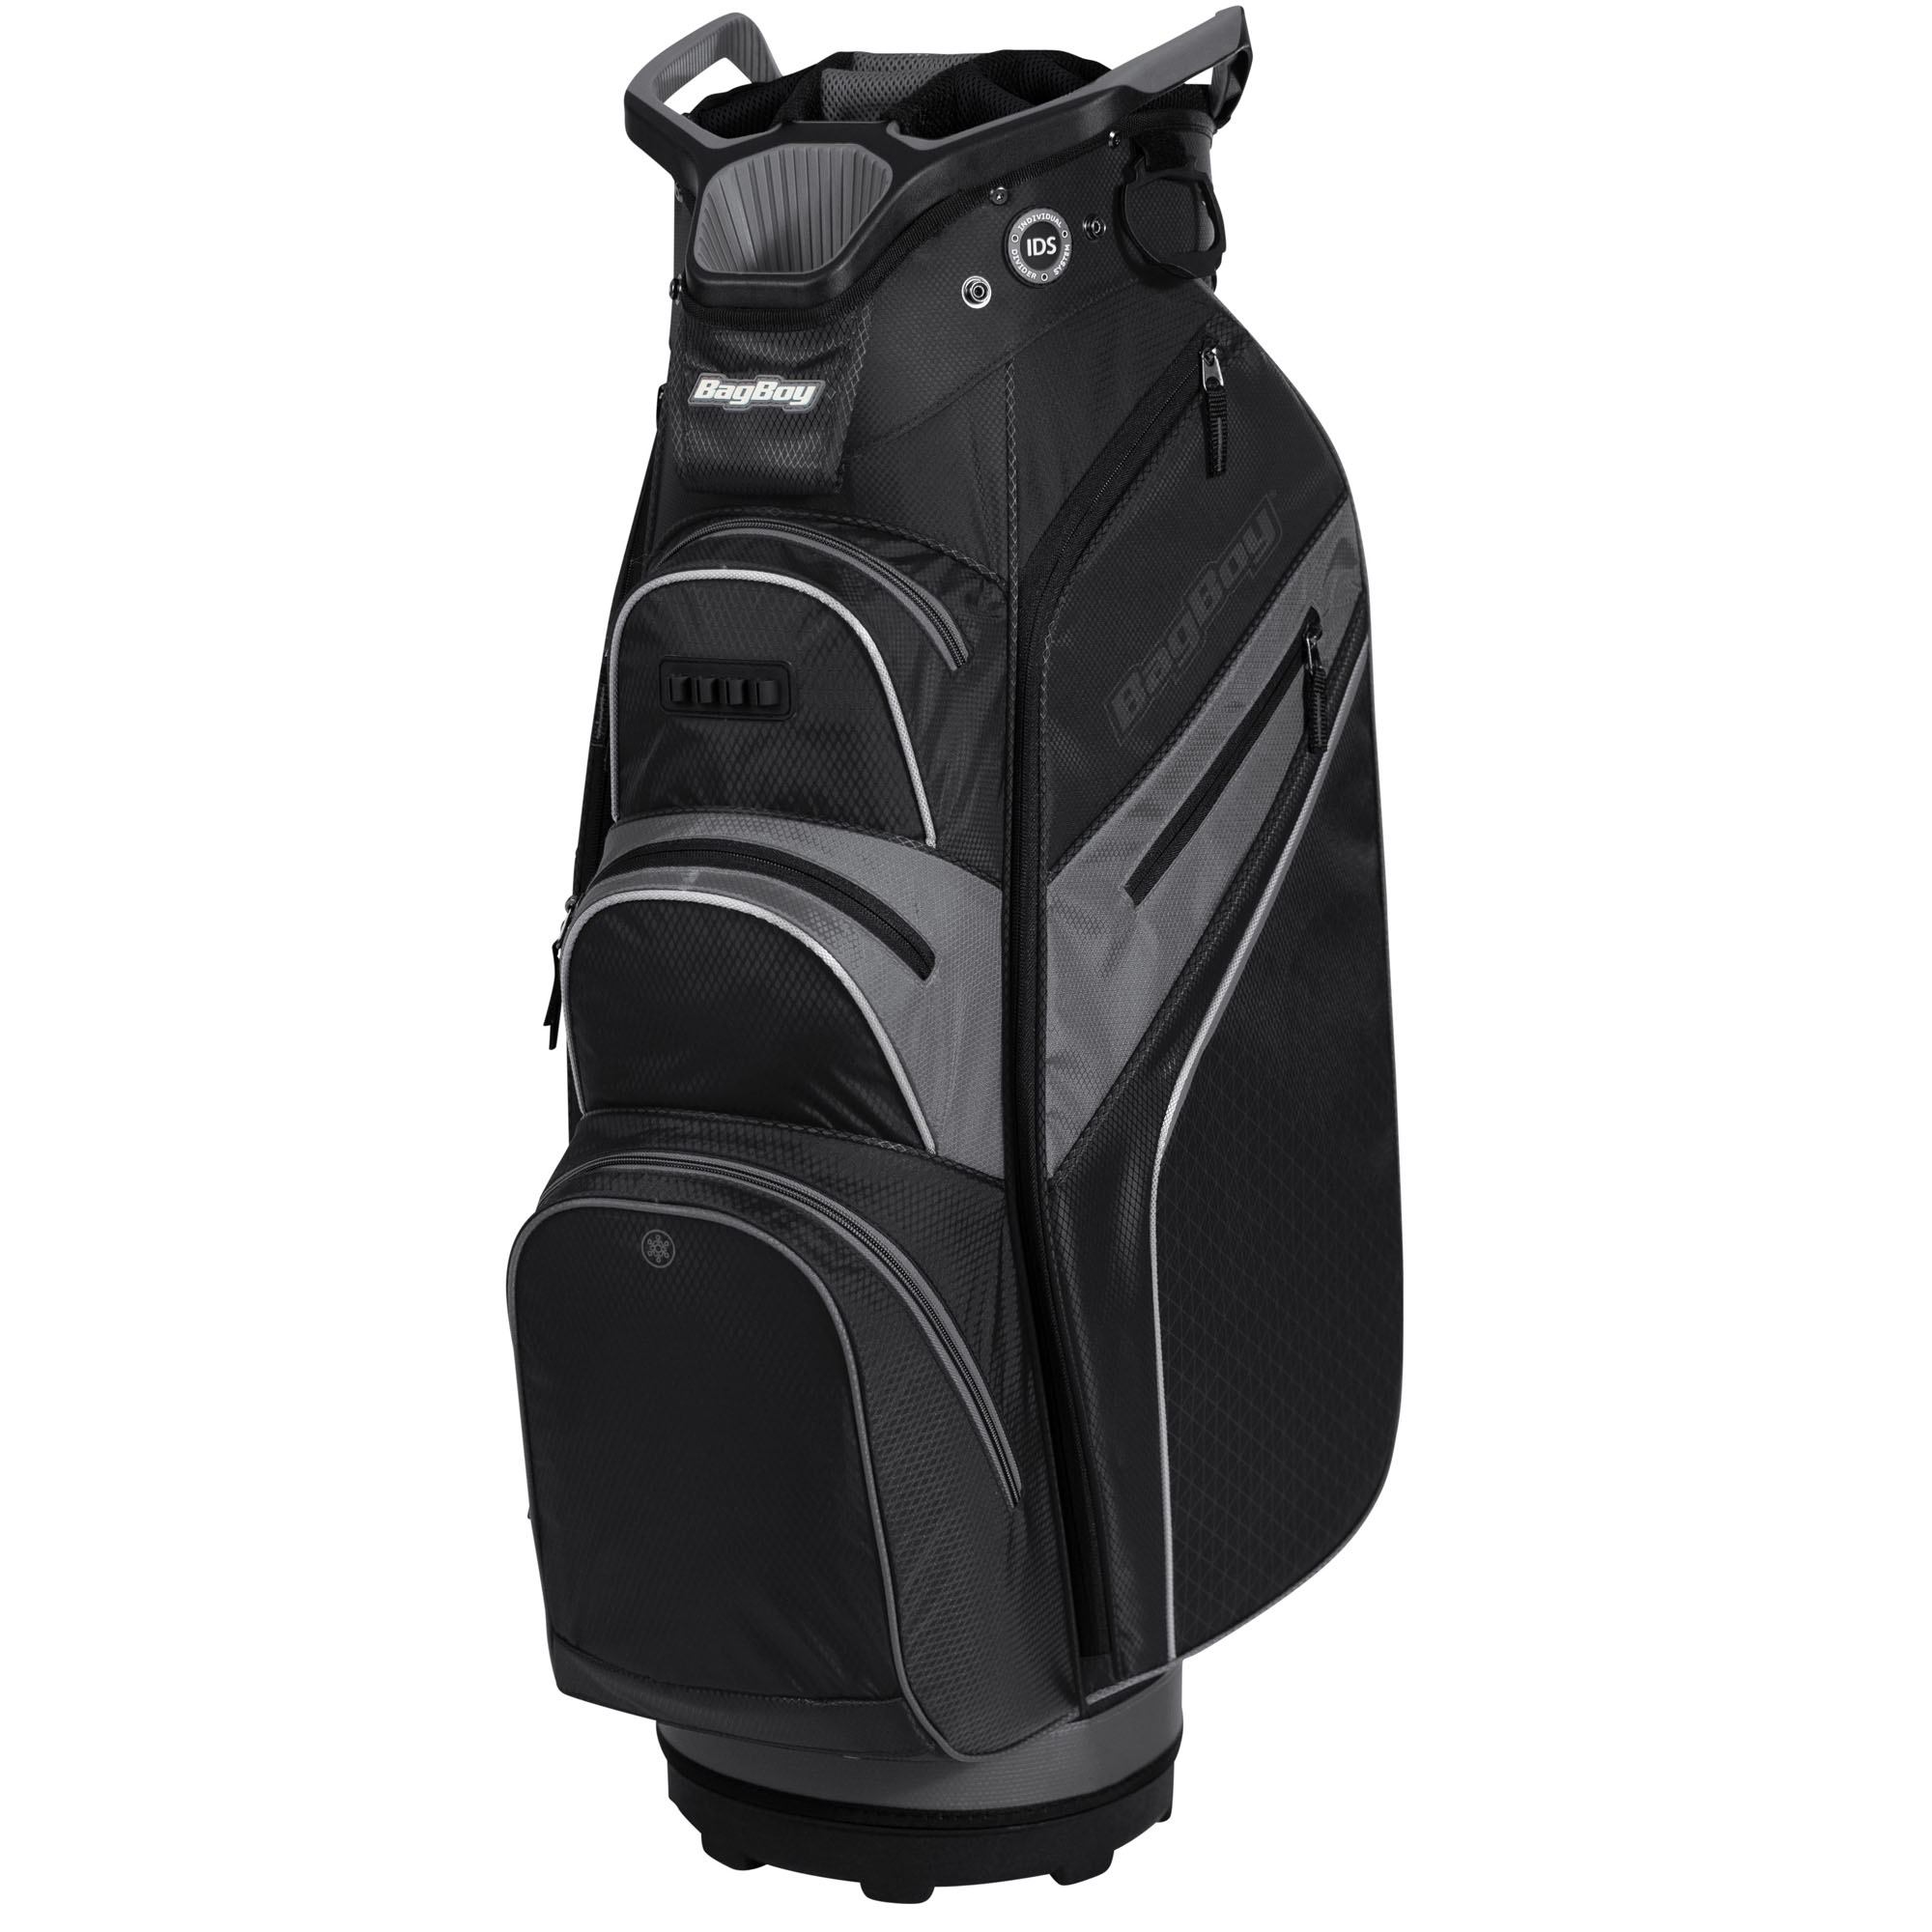 BagBoy Lite Rider Pro Golf Cart Bag – Black/Grey